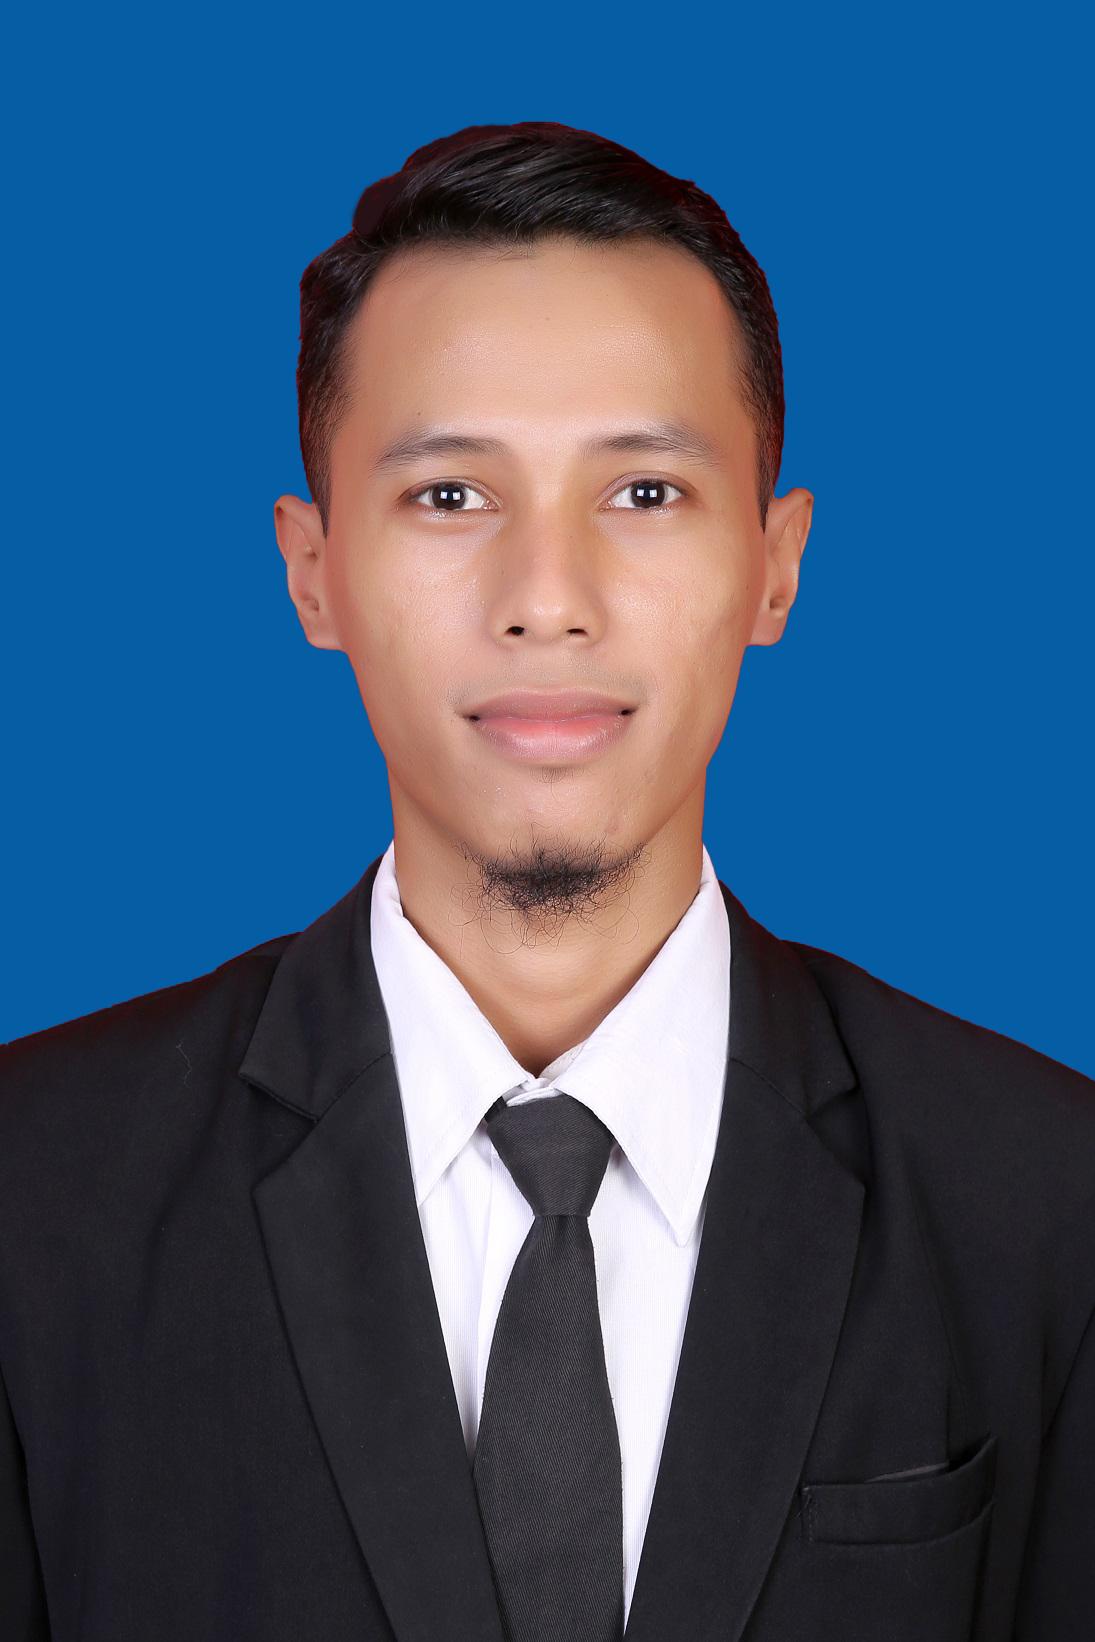 Ahmad Mujahid Syayaf